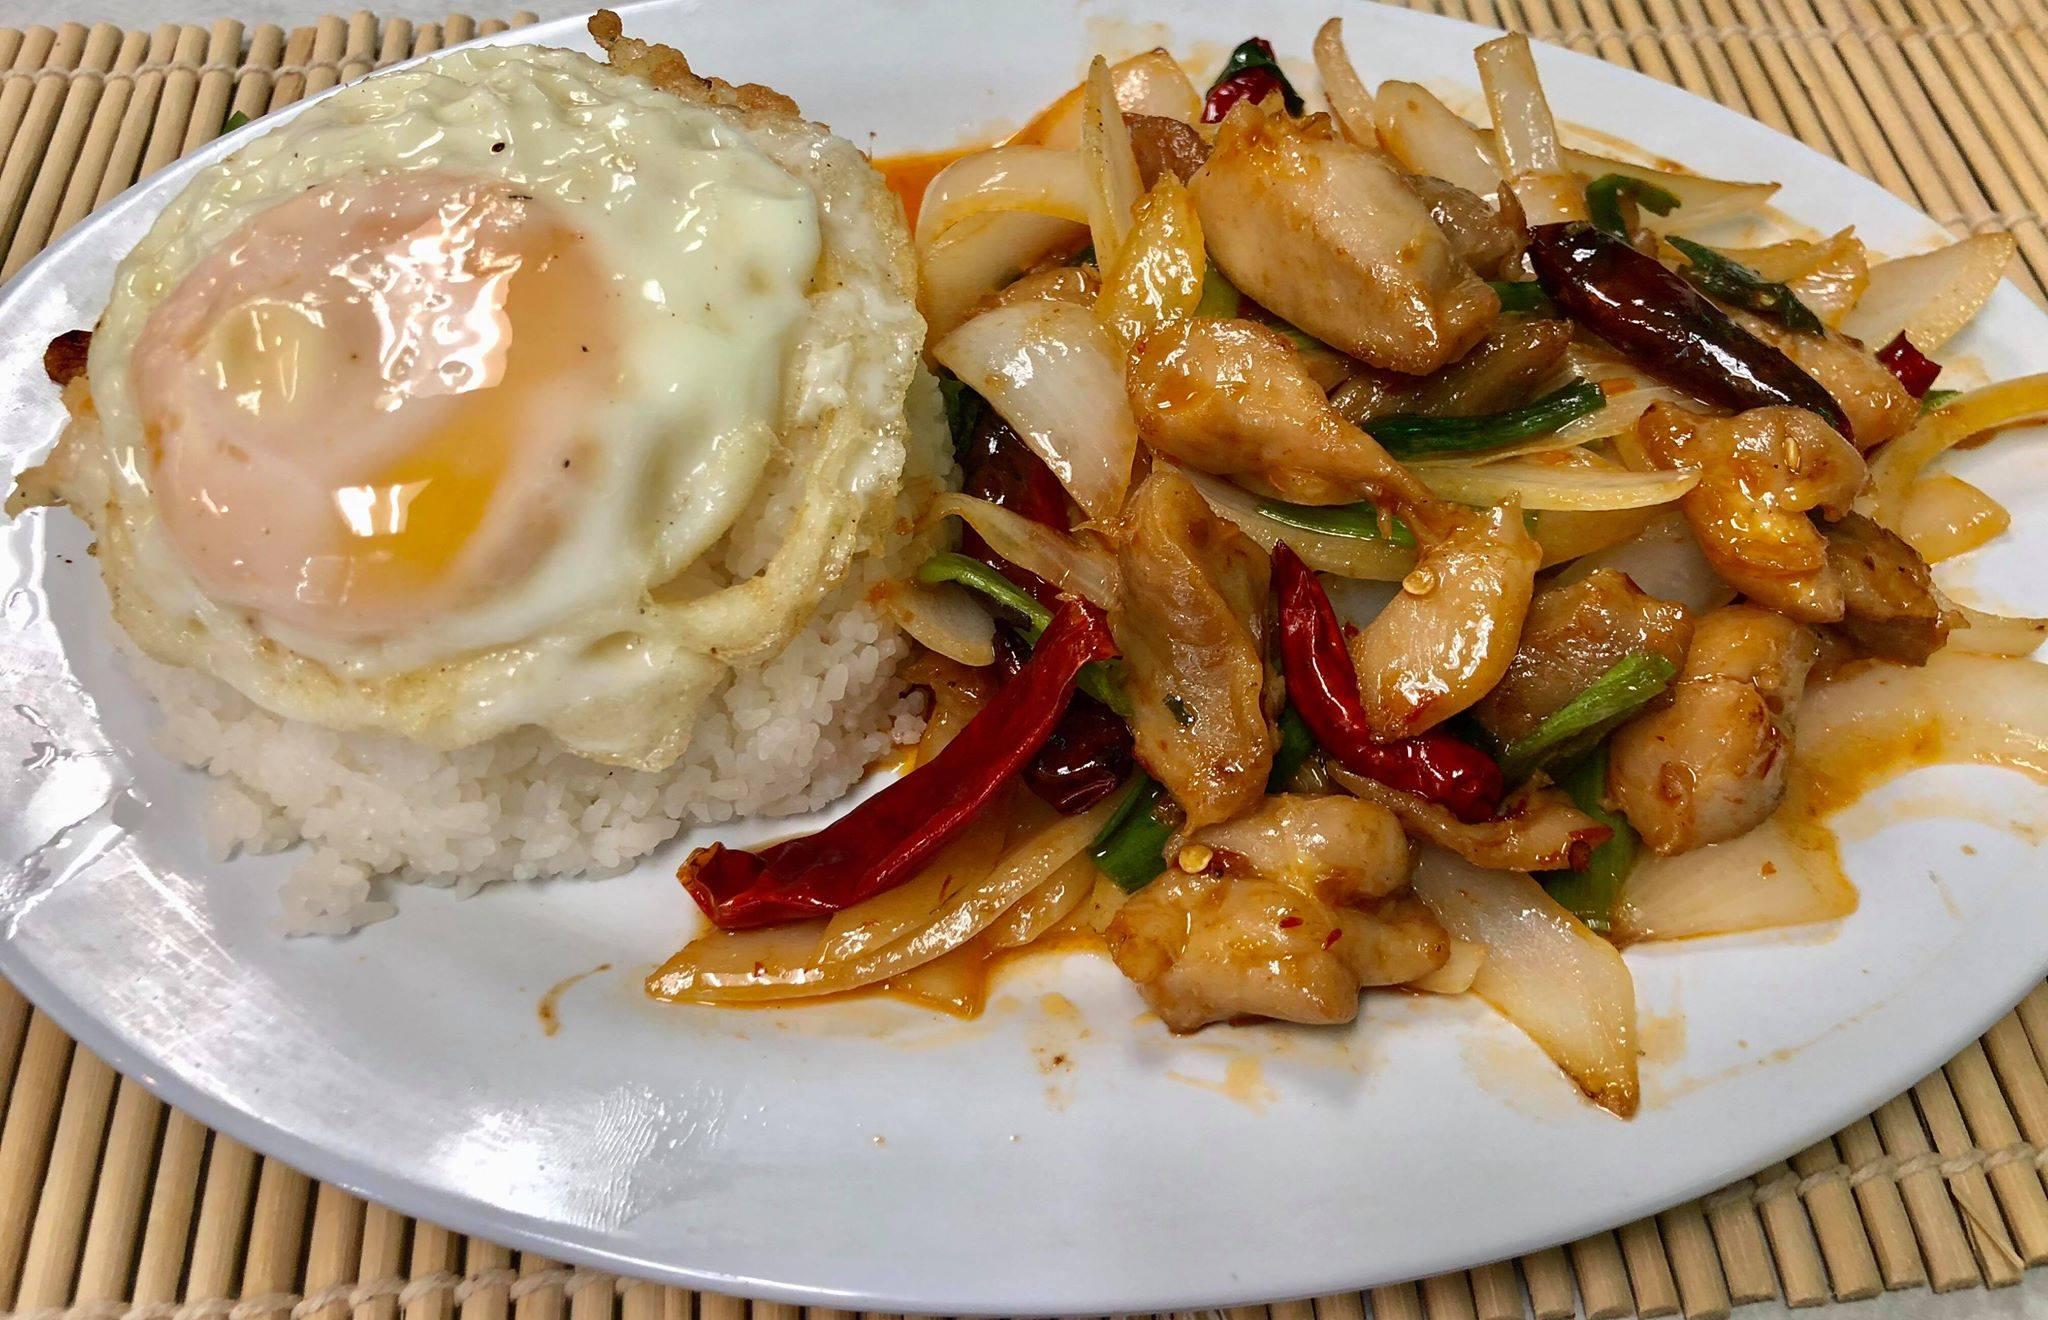 New Pho Saigon 2 Noodle & Grill Restaurant 242 Serra Way, Milpitas